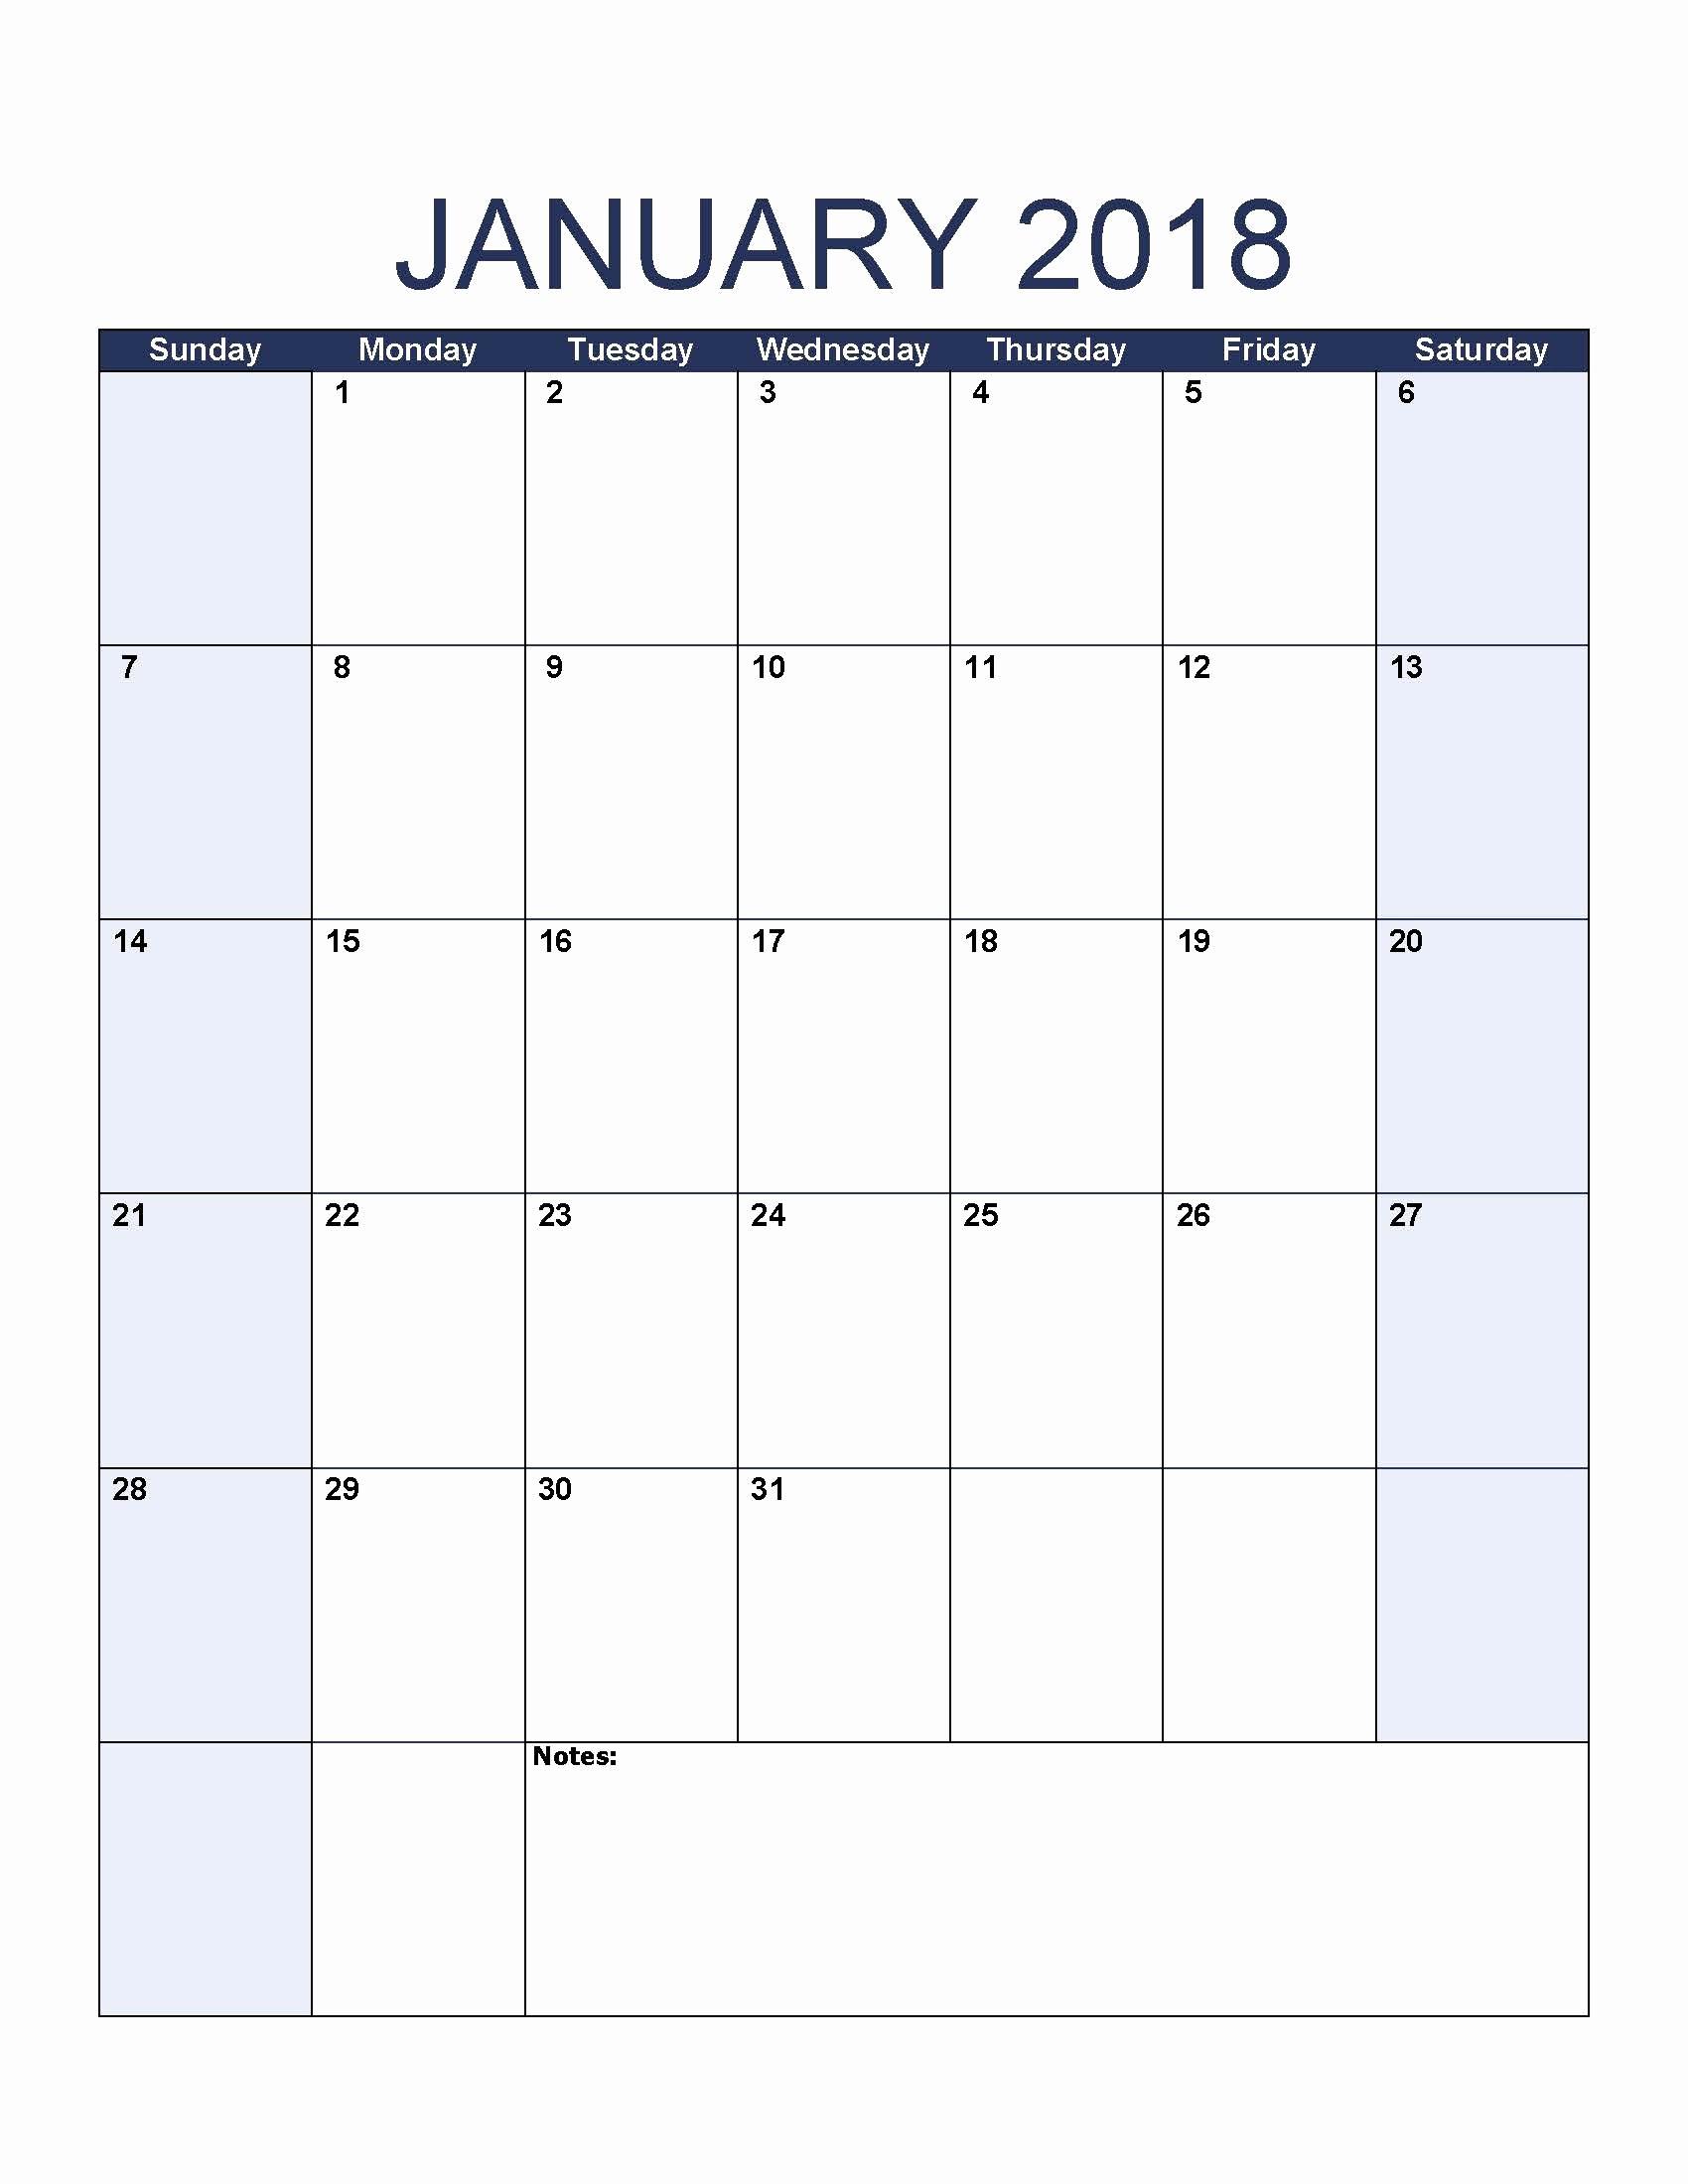 Blank January 2018 Calendar Printable Inspirational Blank January 2018 Calendar to Print